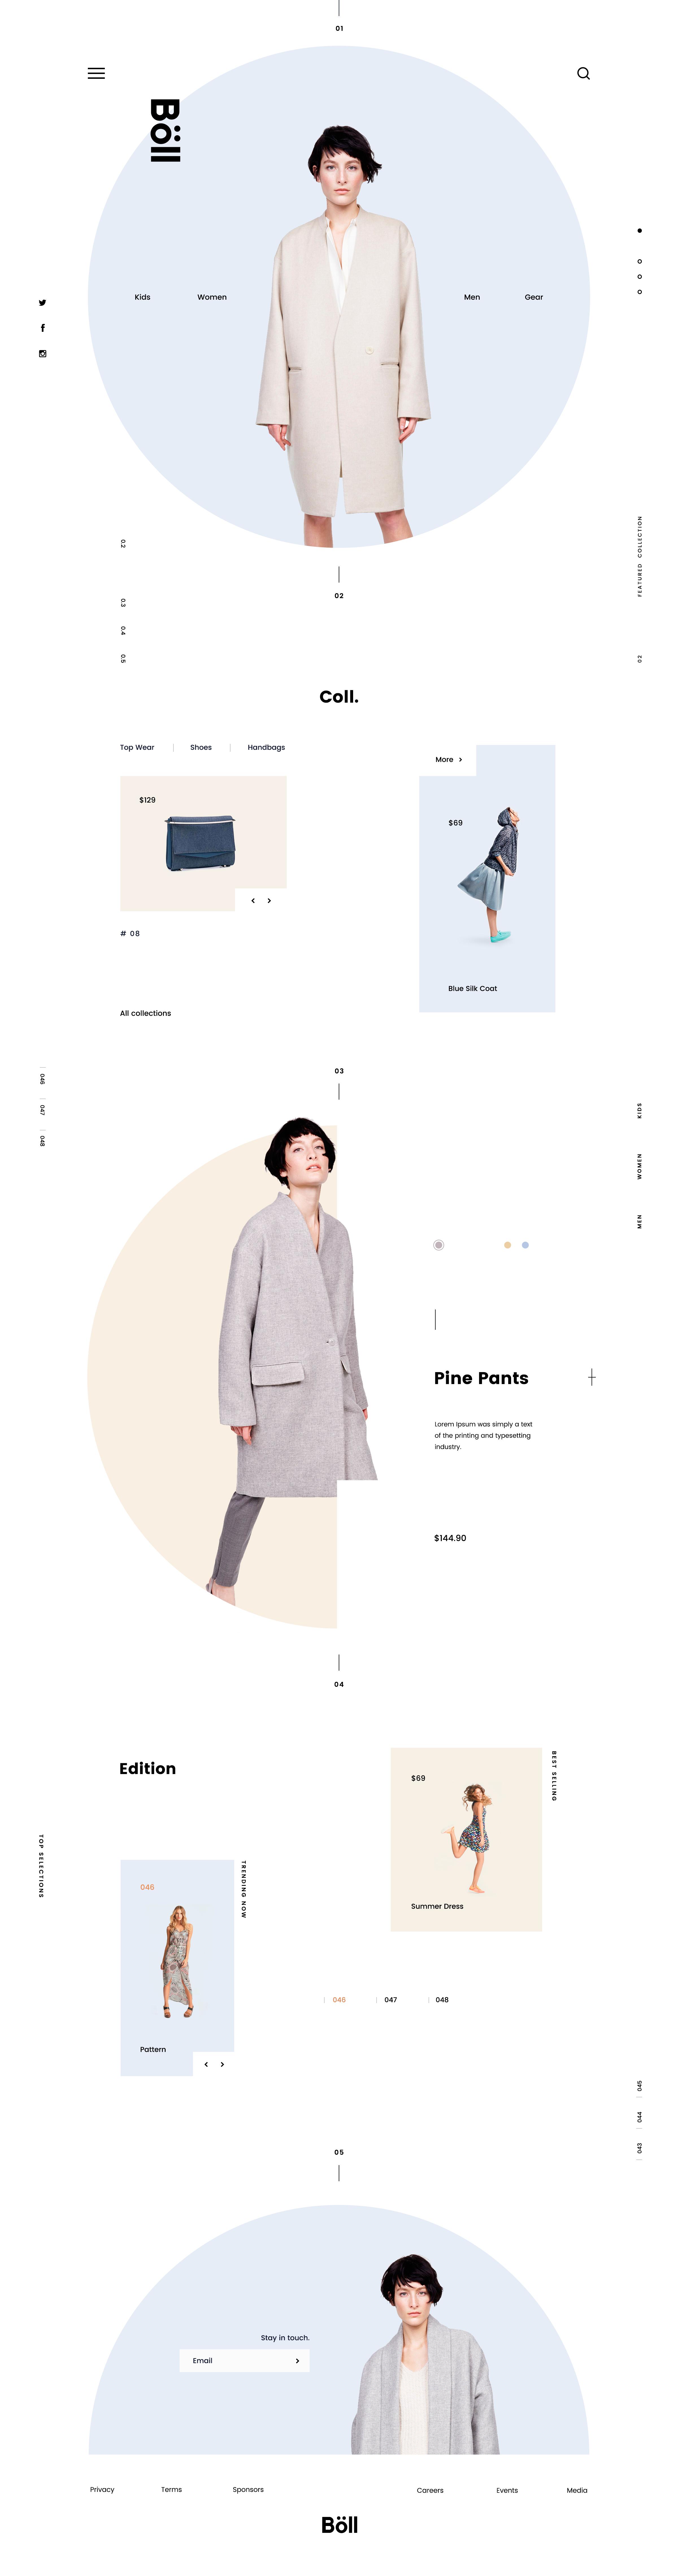 Website Design Inspiration